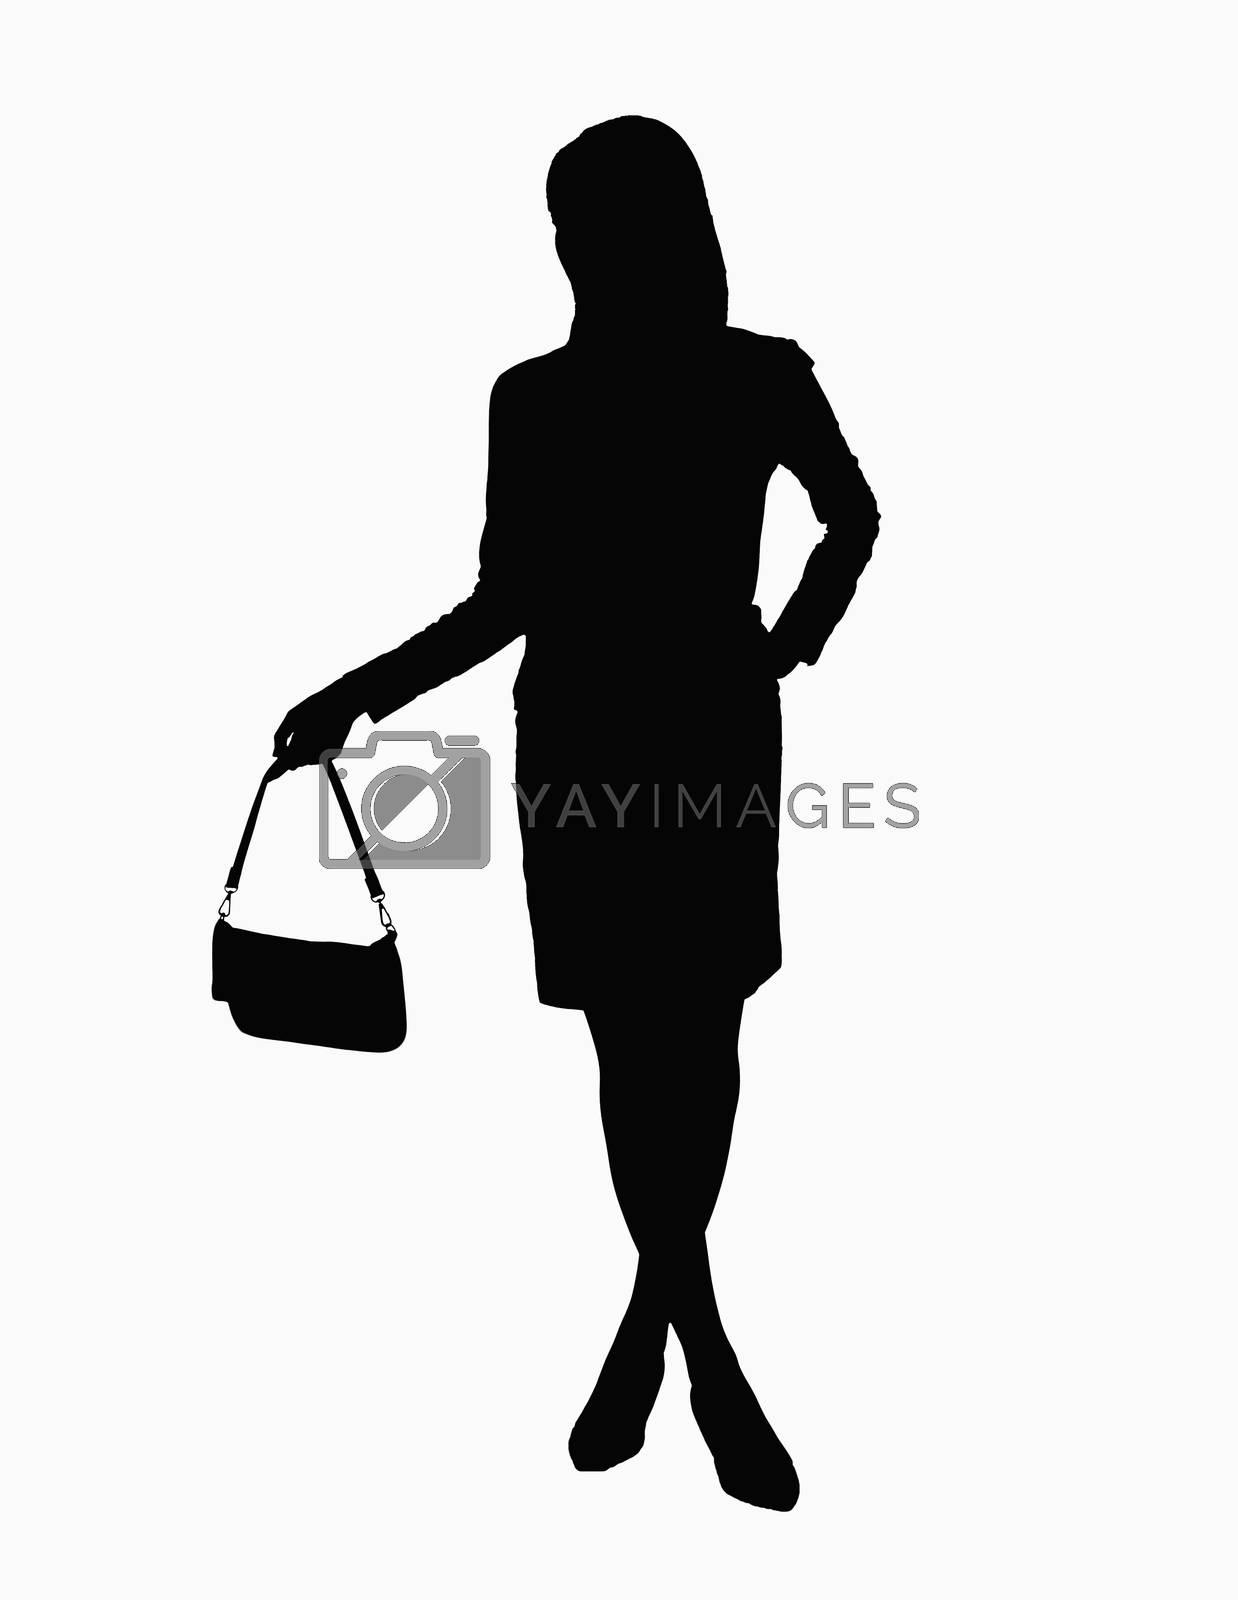 Silhouette of businesswoman holding handbag. by XiXinXing